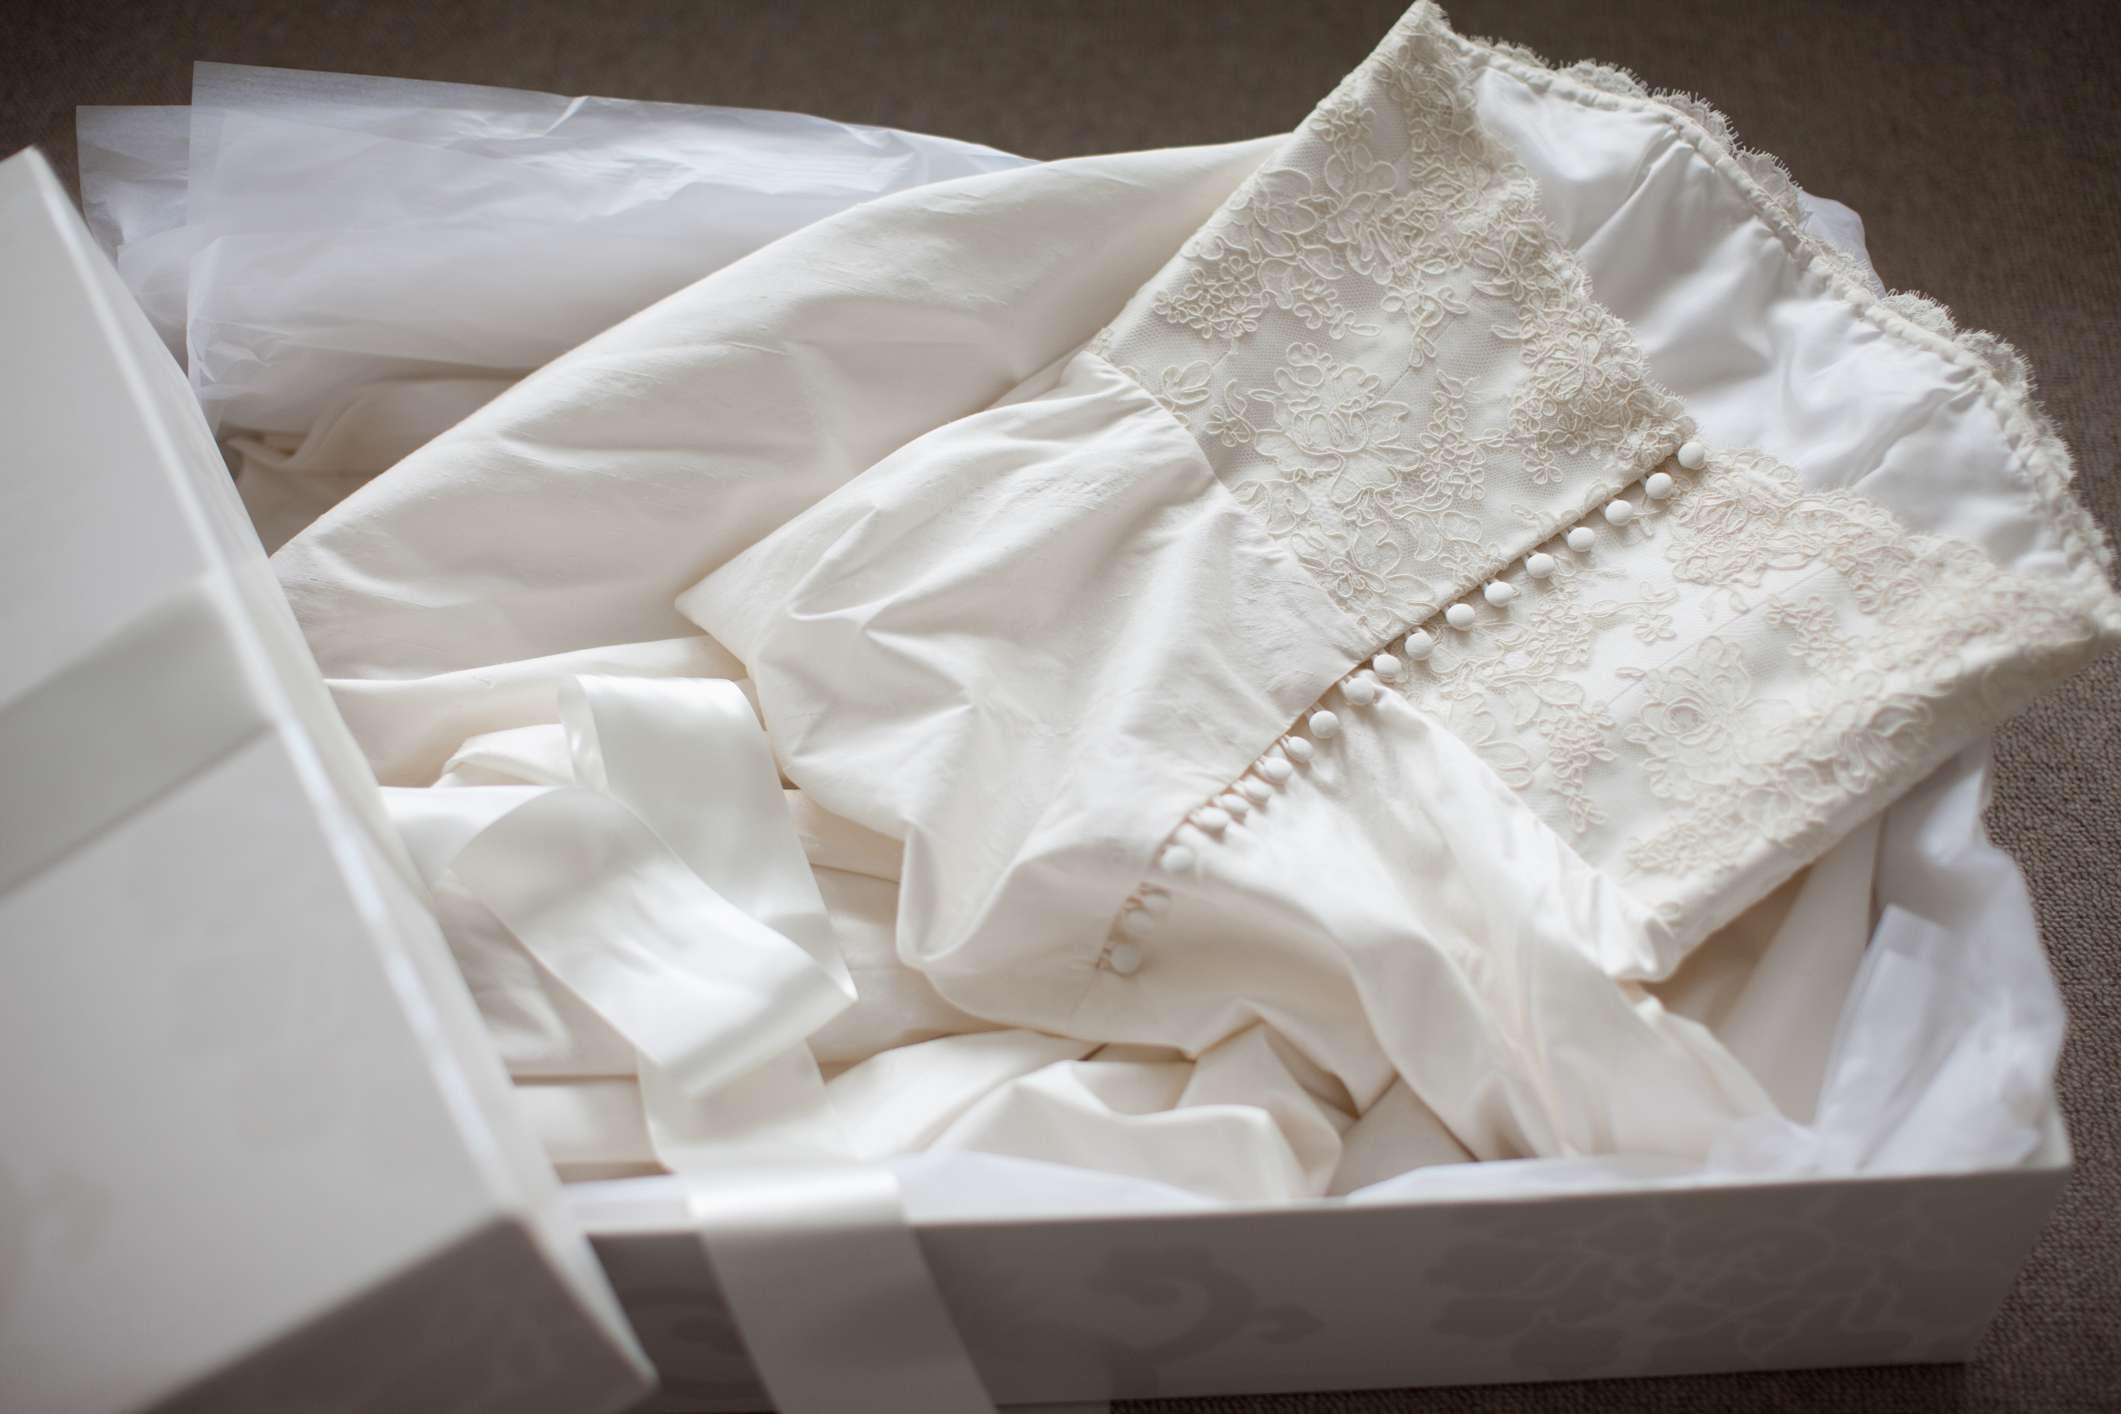 wedding dress in storage box